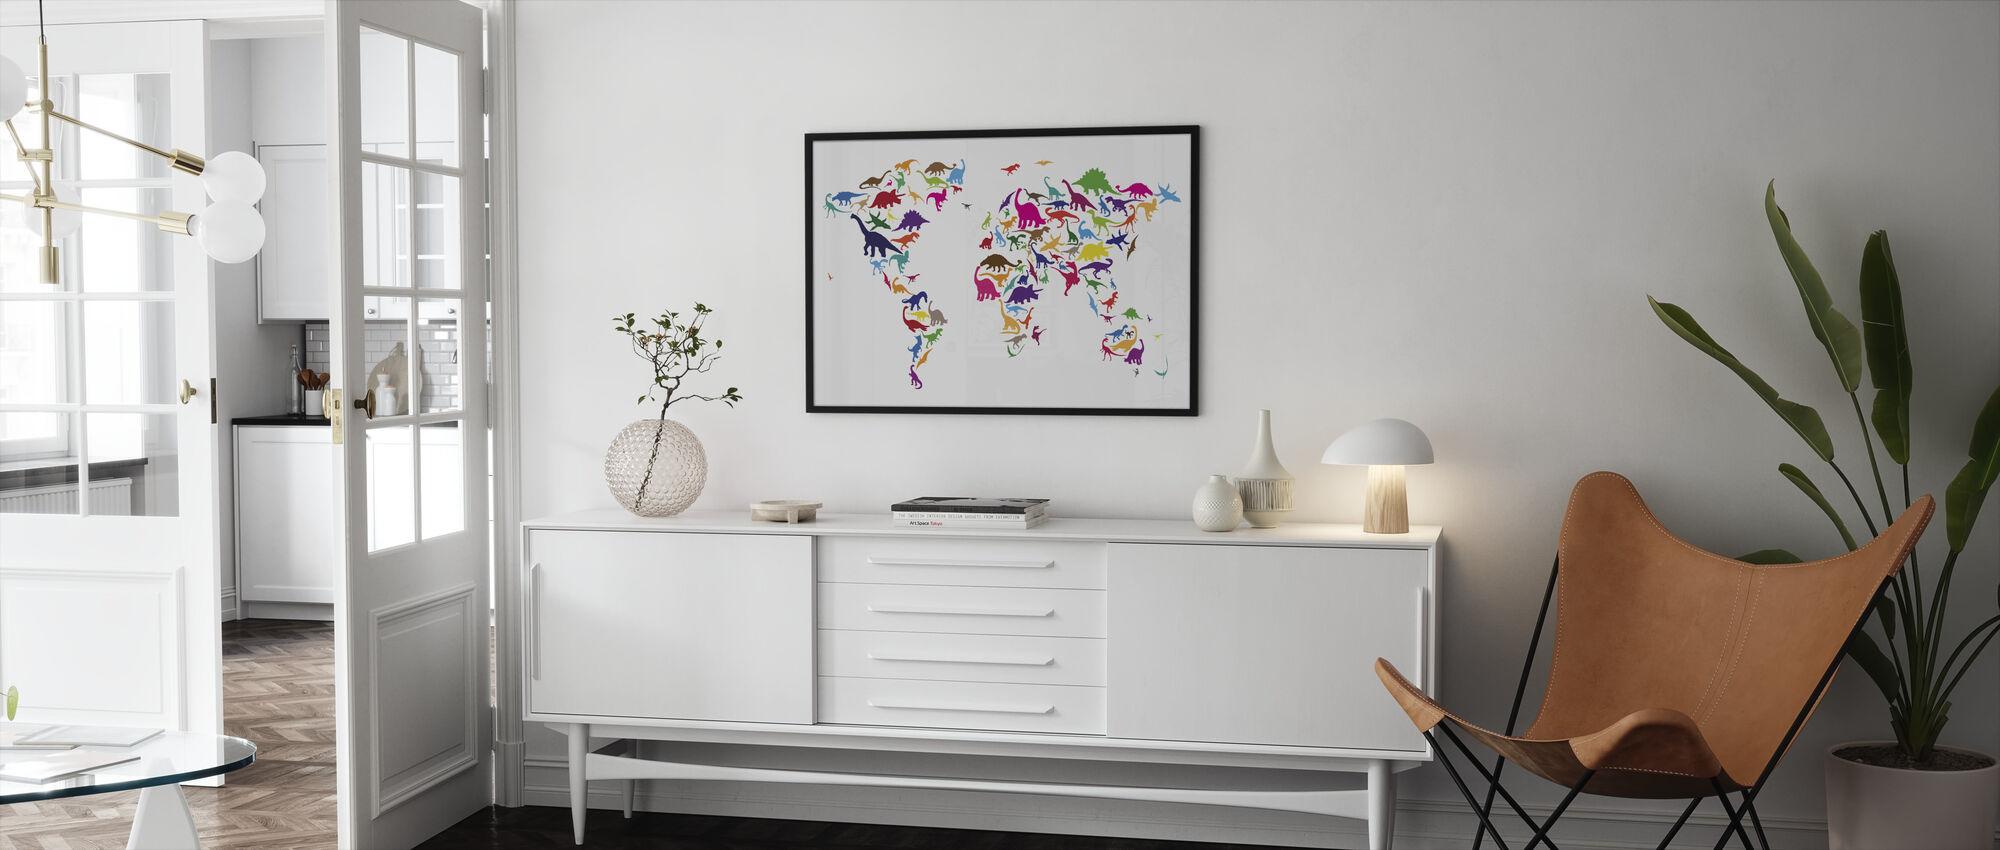 Dinosaur World Map - Framed print - Living Room